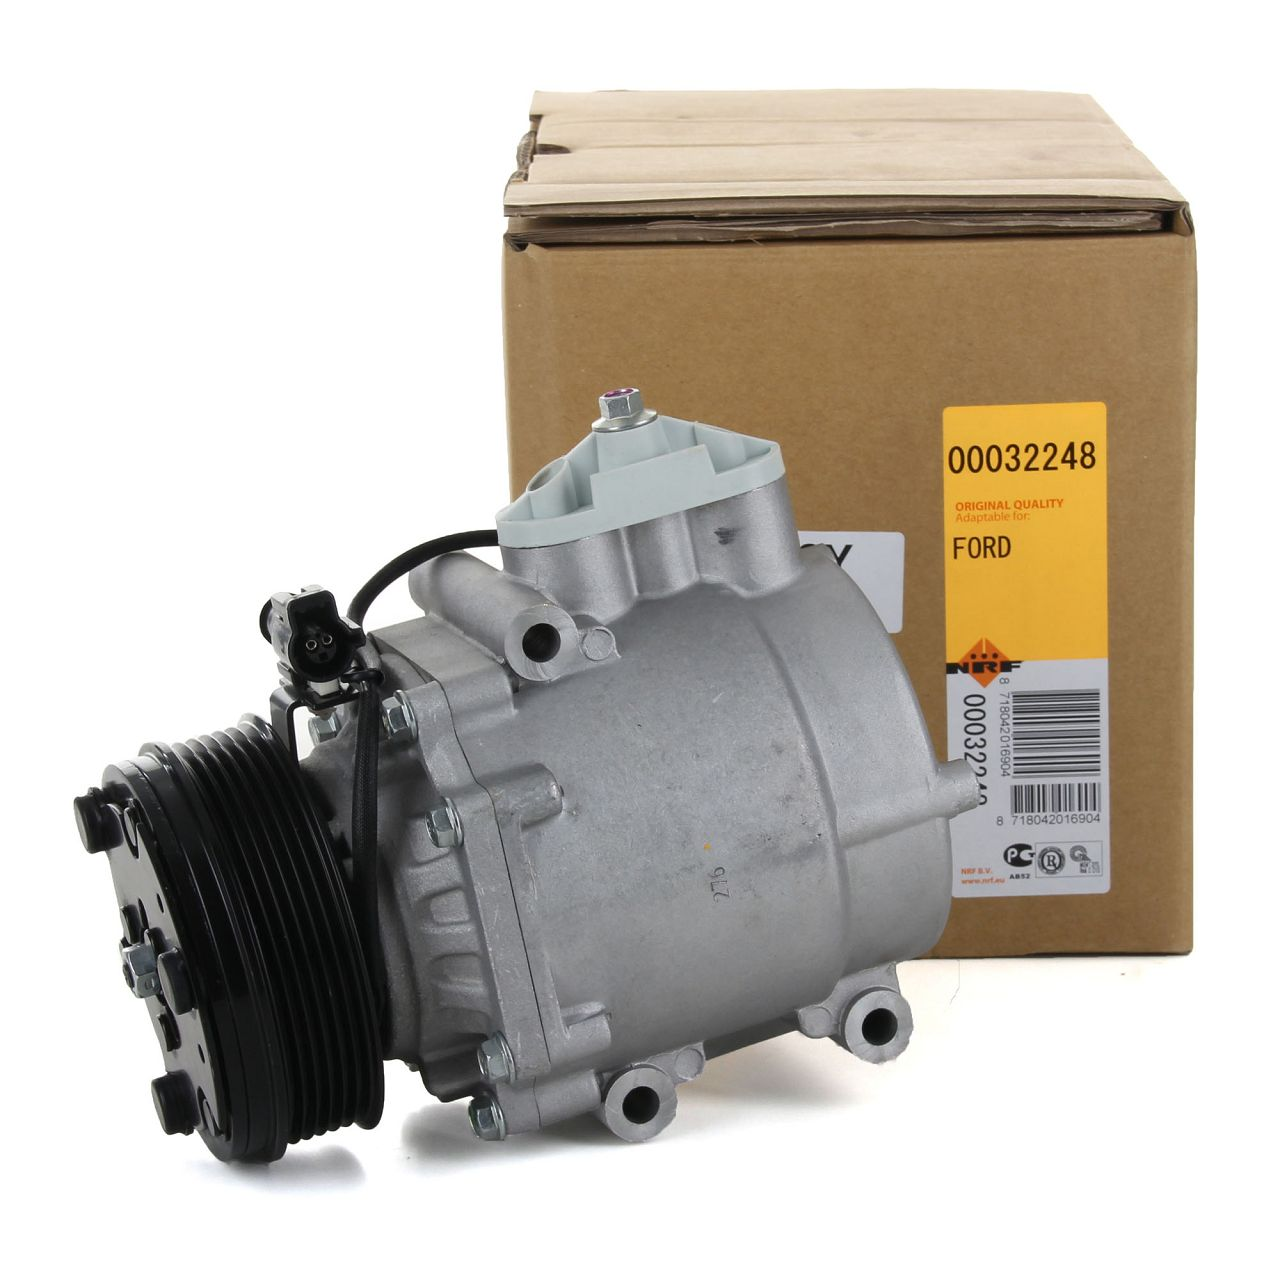 NRF 32248 Kompressor Klimaanlage EASY FIT für FORD COUGAR MONDEO II III 2.5 3.0